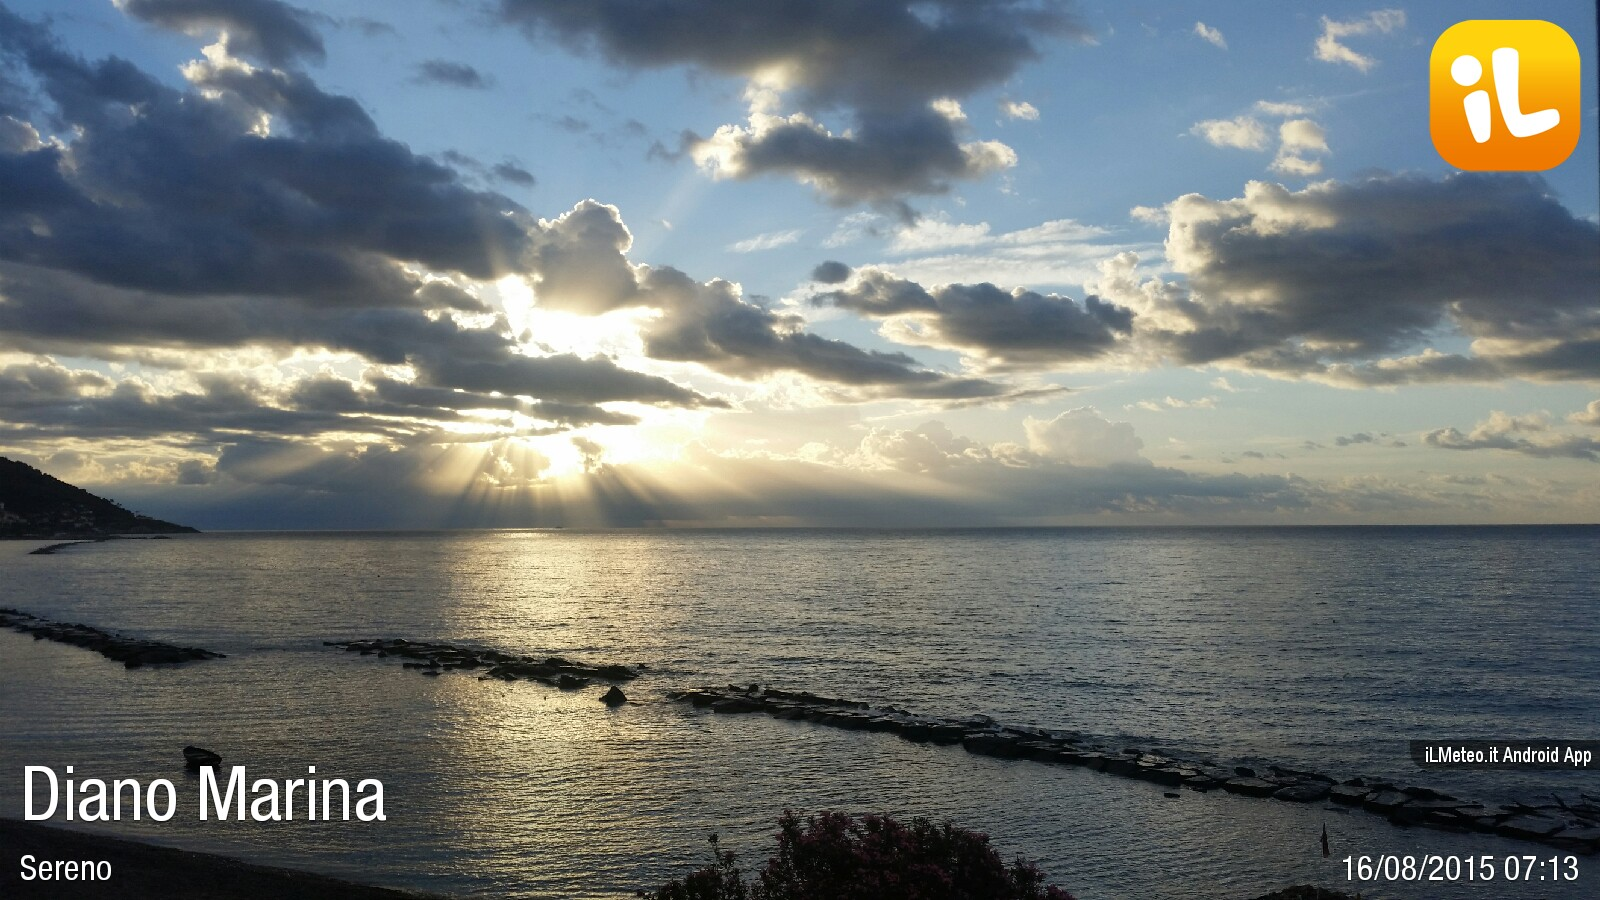 Foto meteo diano marina diano marina ore 7 15 for Bagni arcobaleno sottomarina webcam